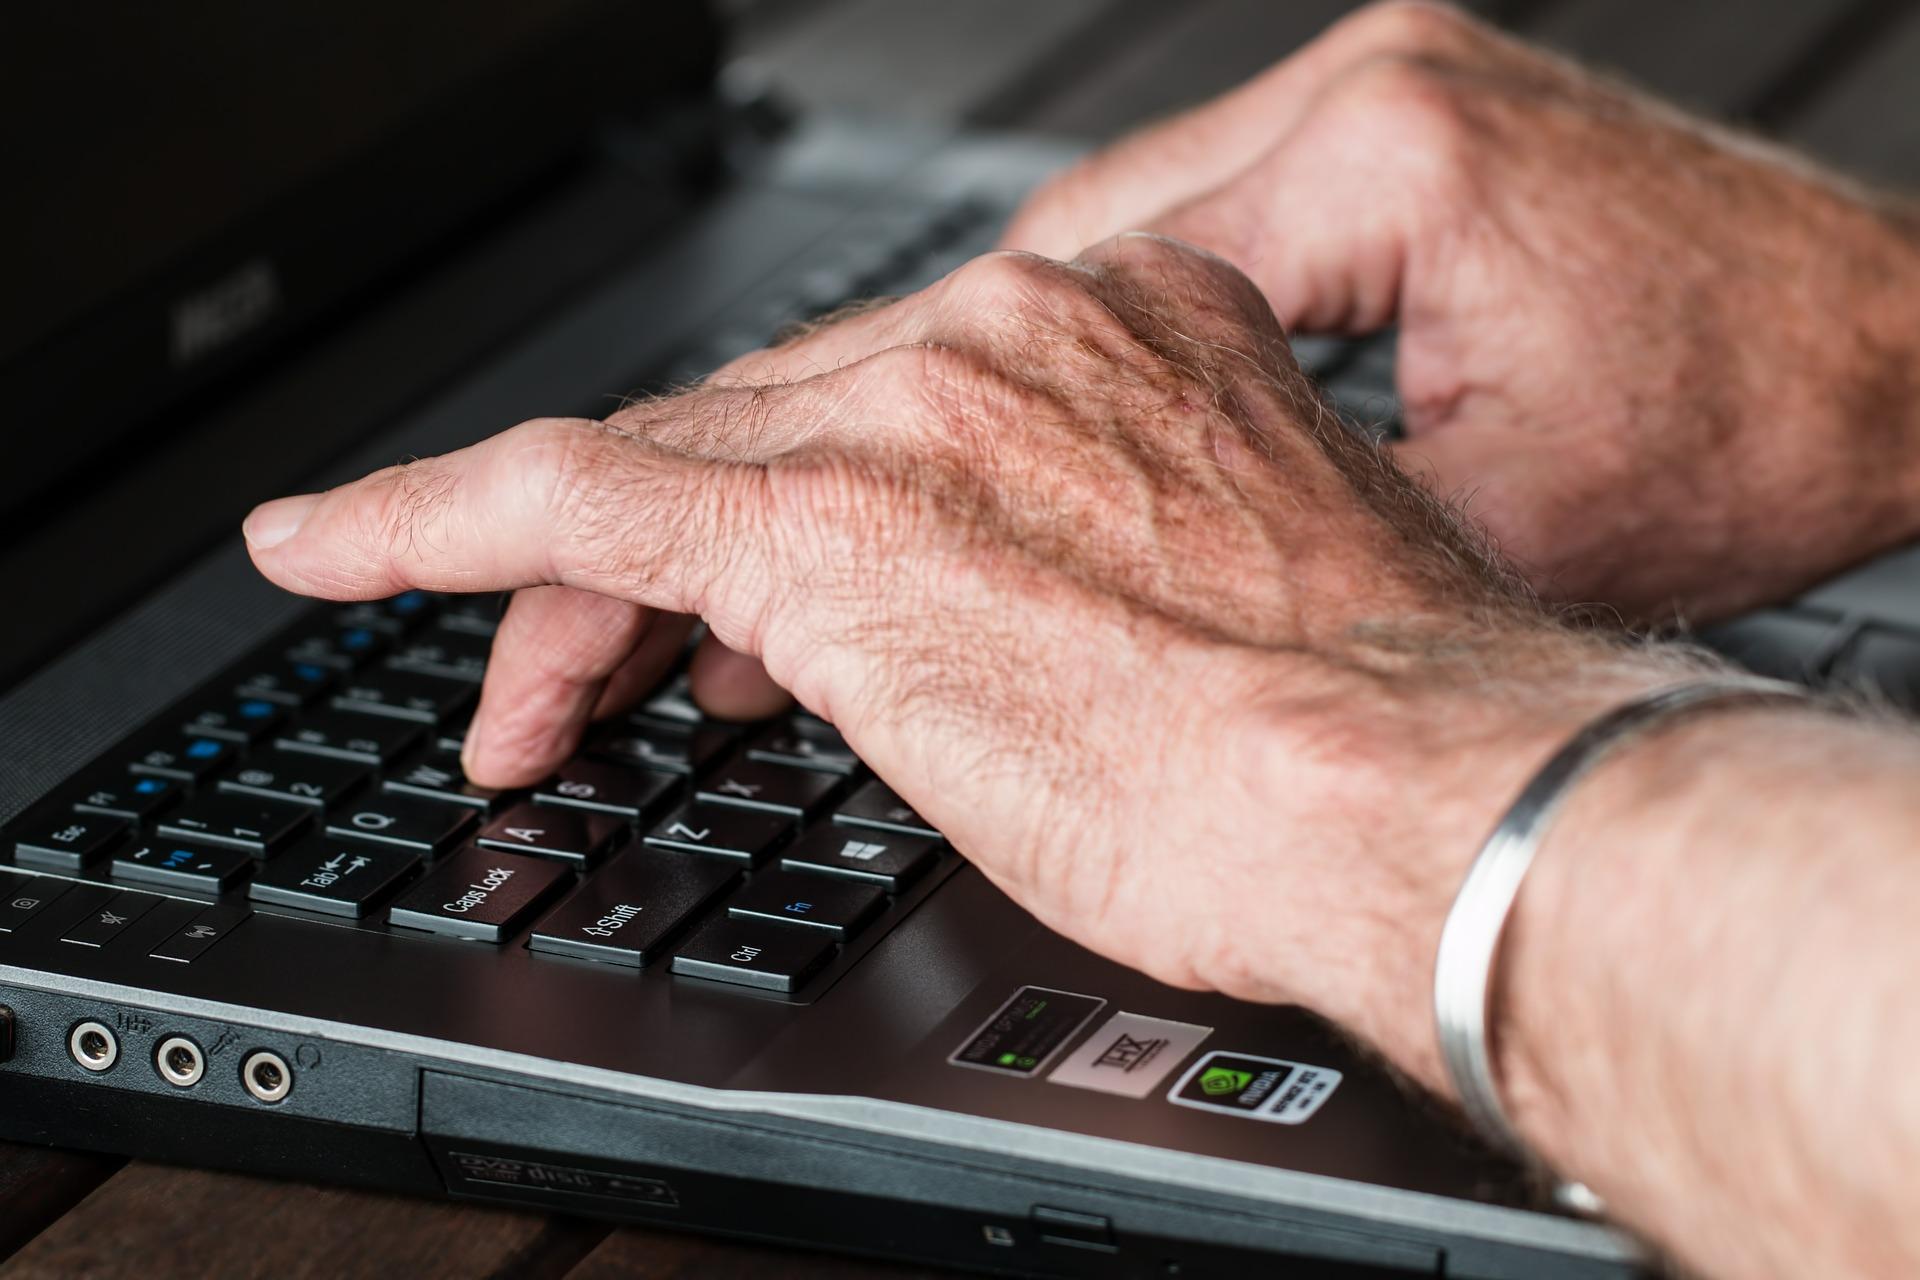 hands, aging skin, old hands